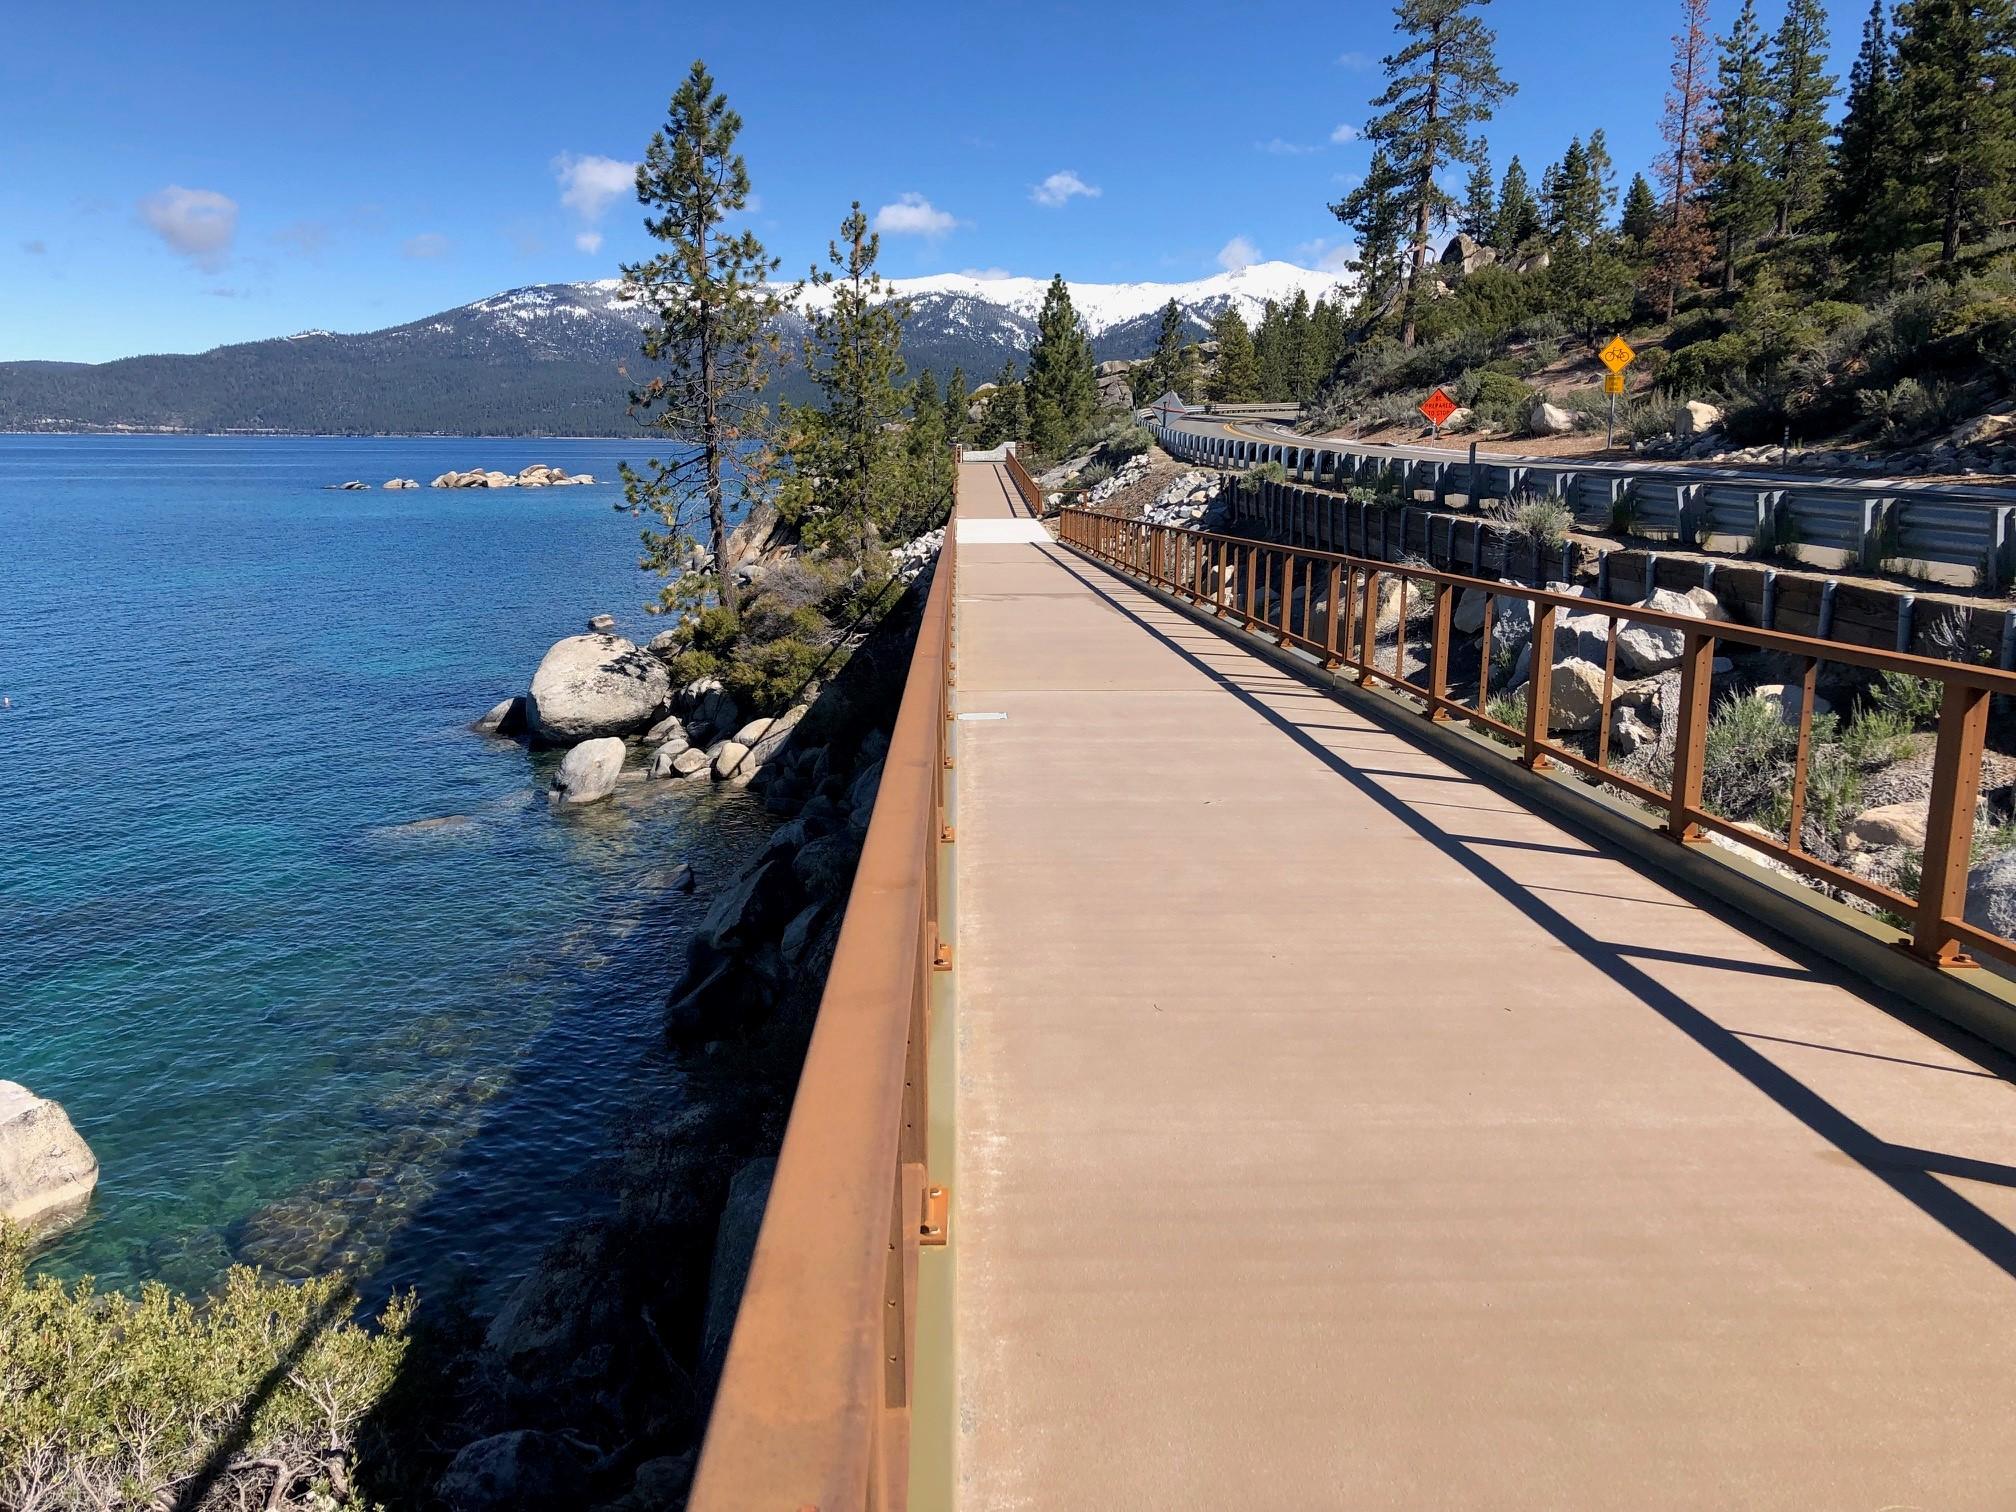 Lake Tahoe Shared Use Path